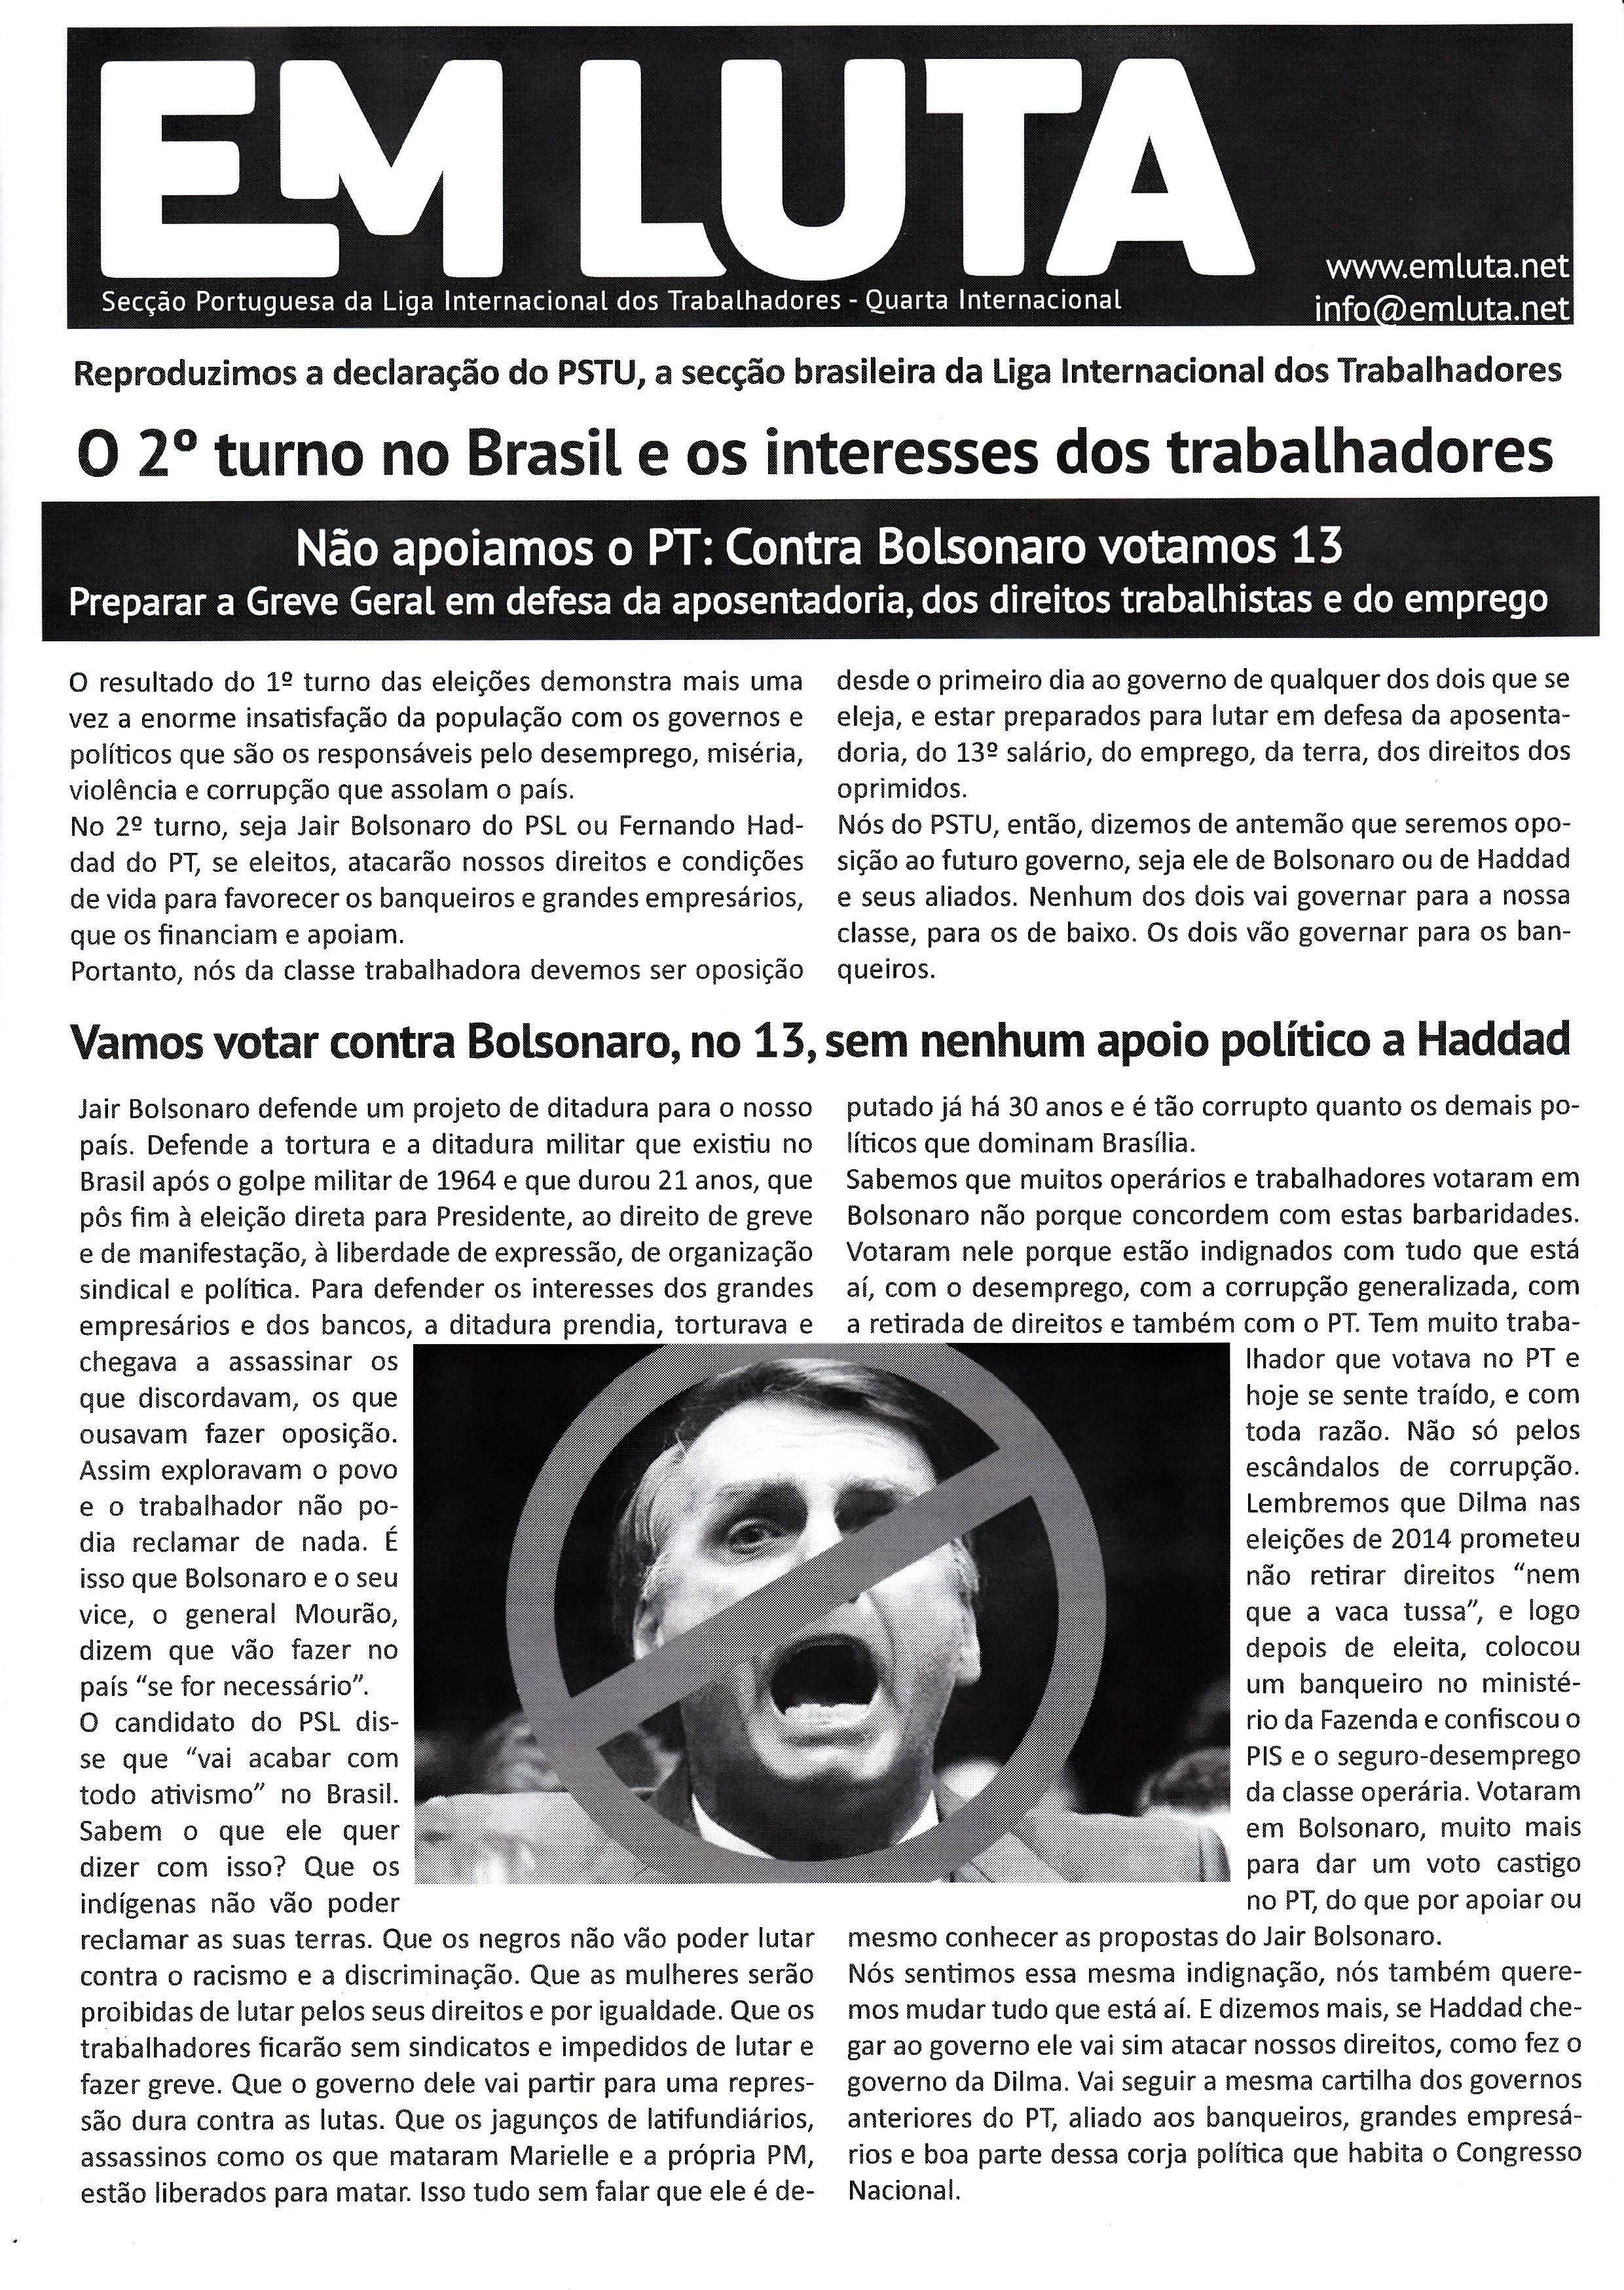 Em_Luta_brasil_01